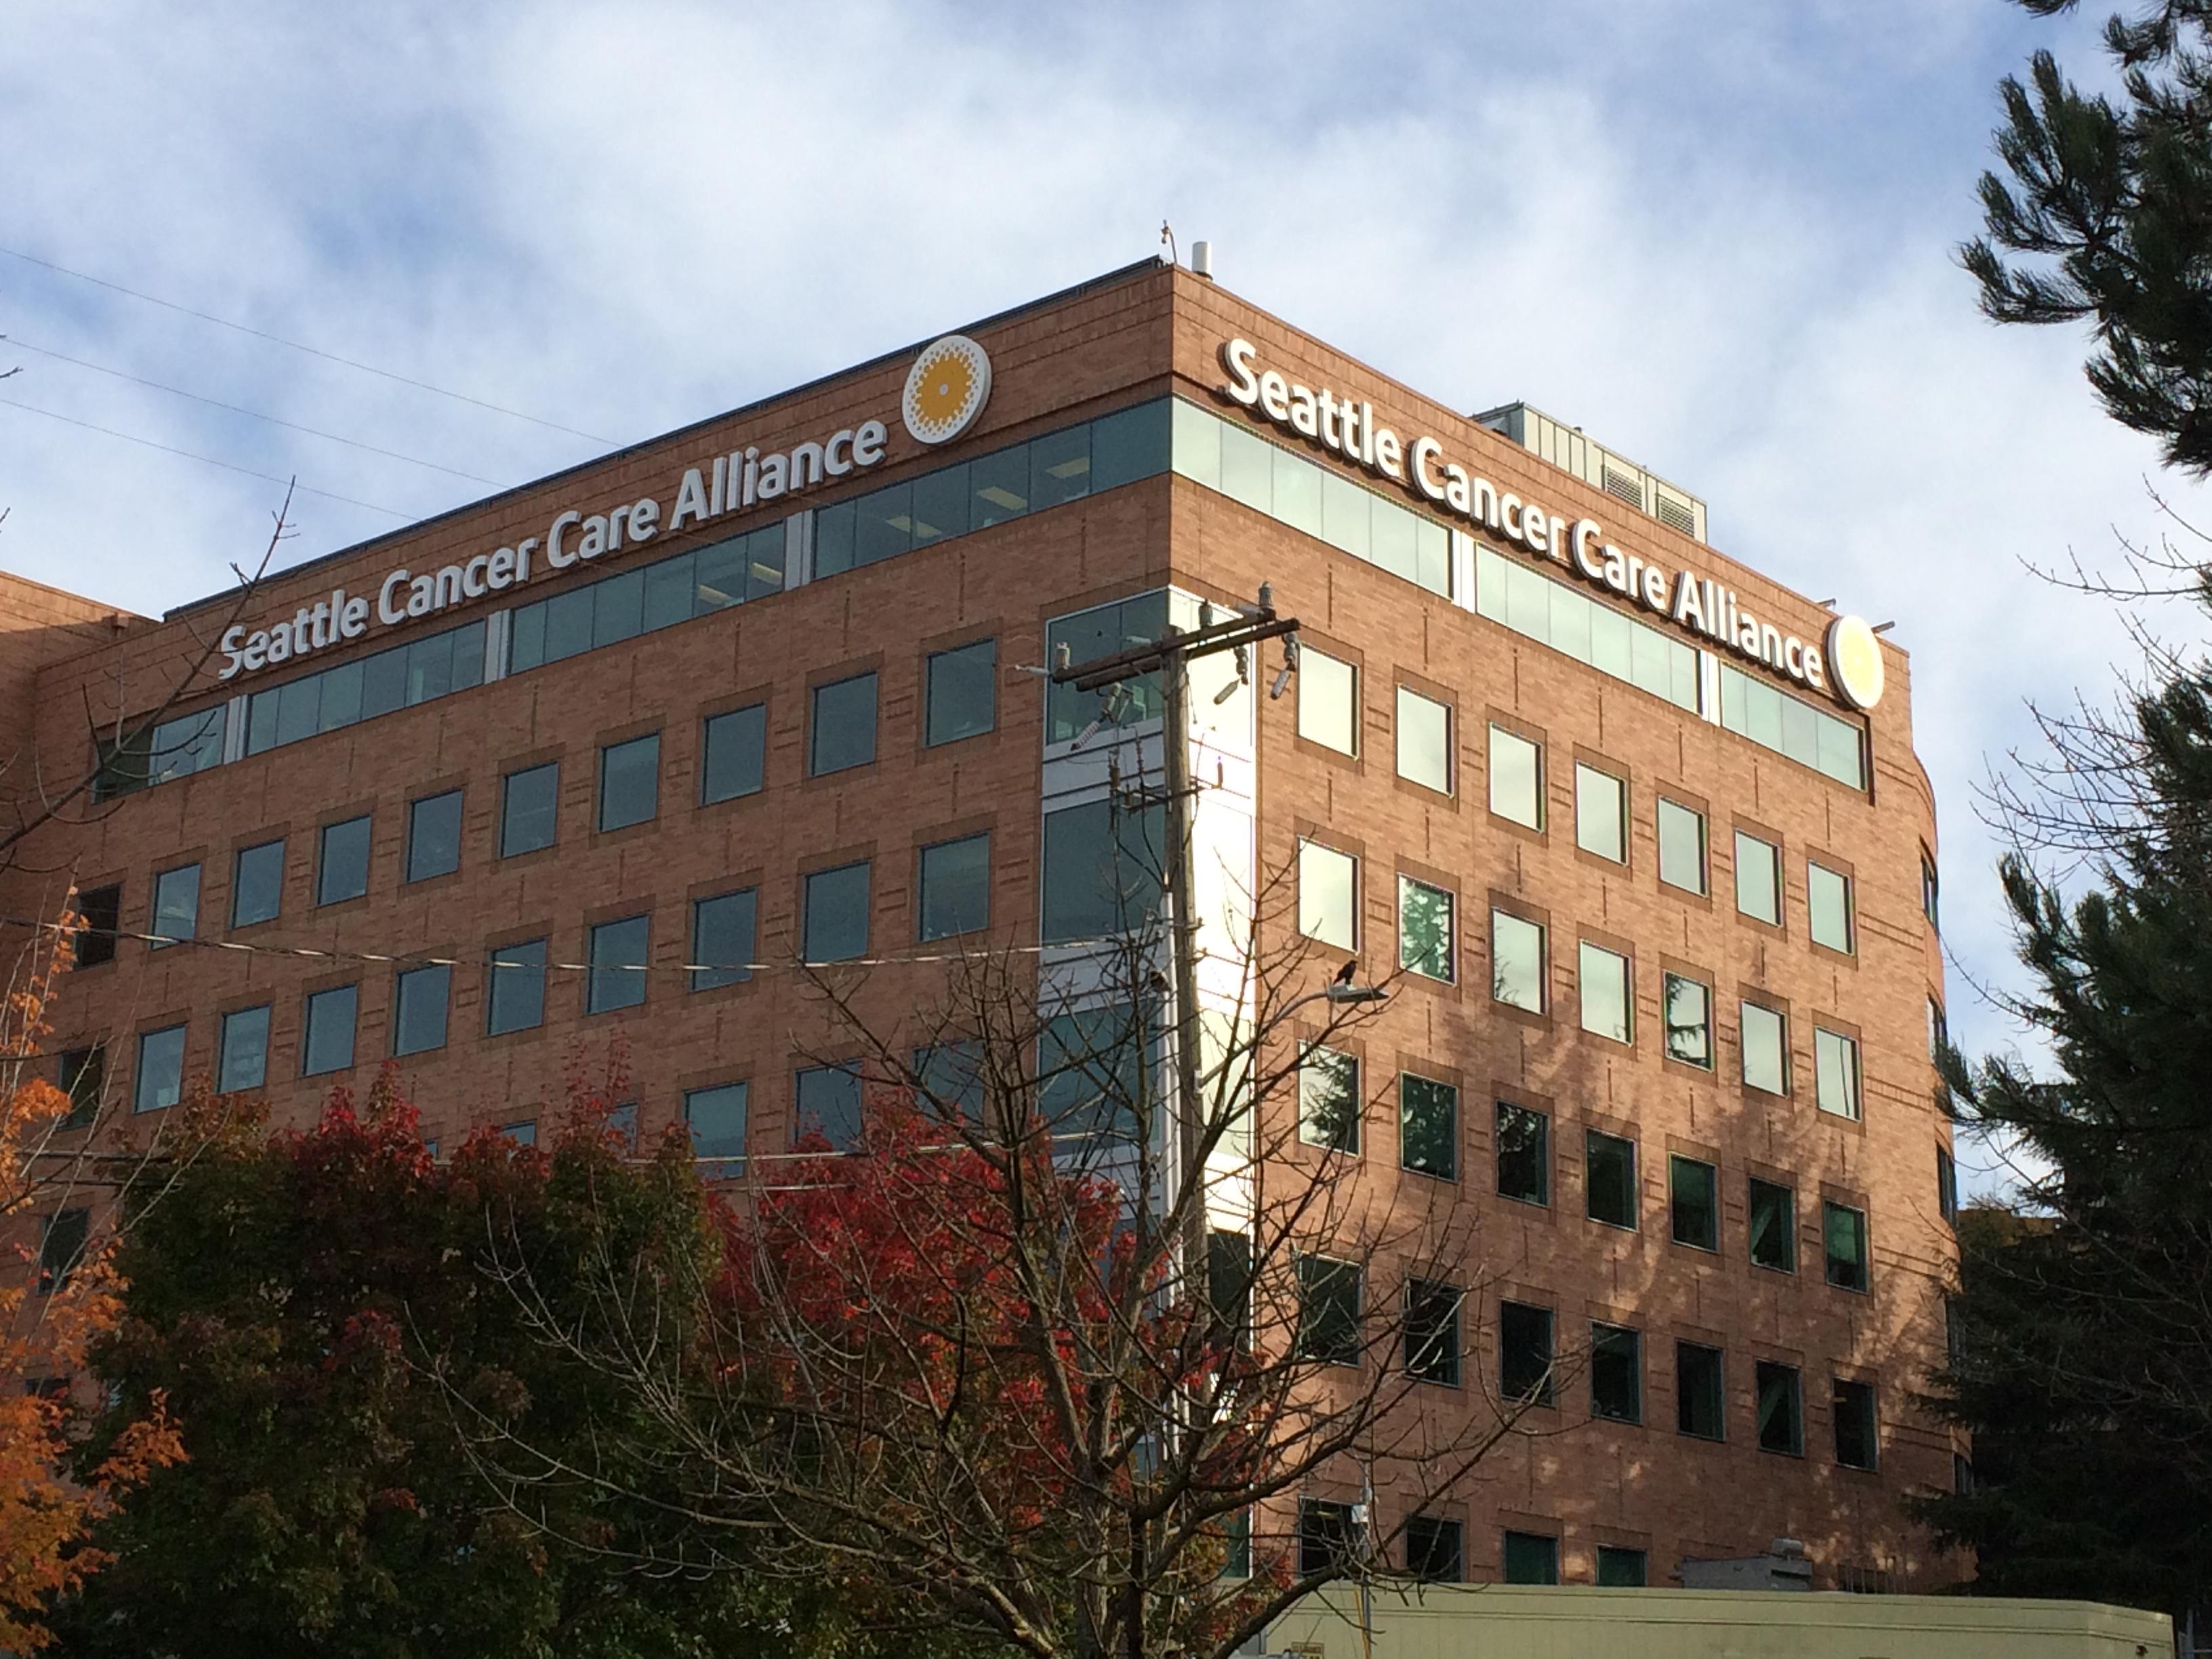 SCCA Building